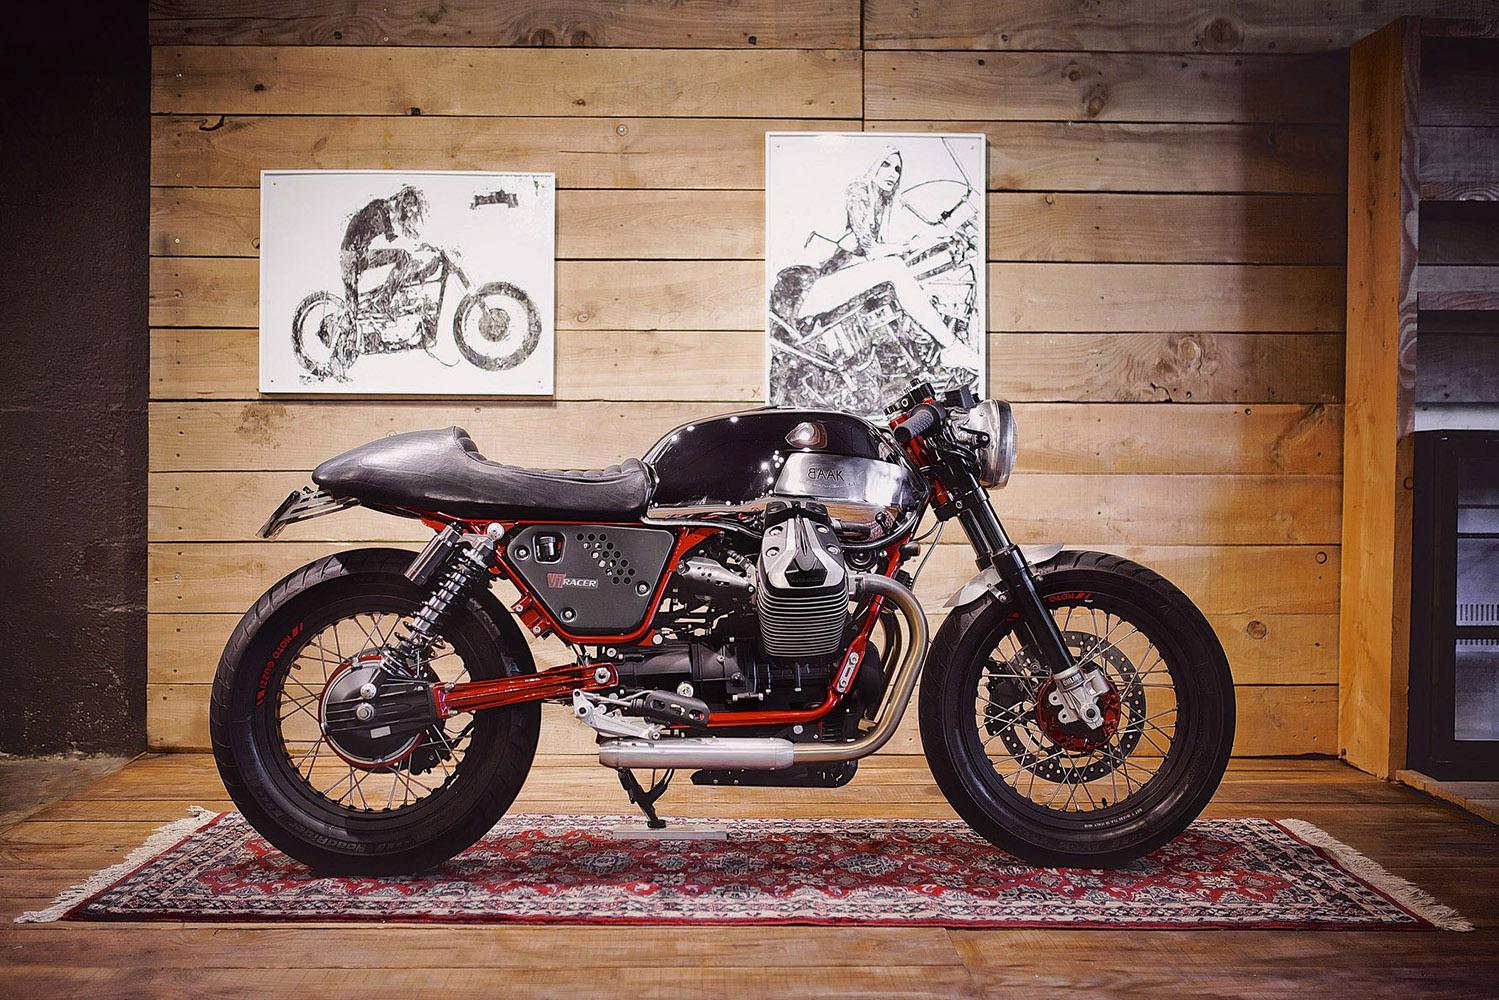 moto guzzi cafe racer goodness by baak motorcyclettes the bullitt. Black Bedroom Furniture Sets. Home Design Ideas